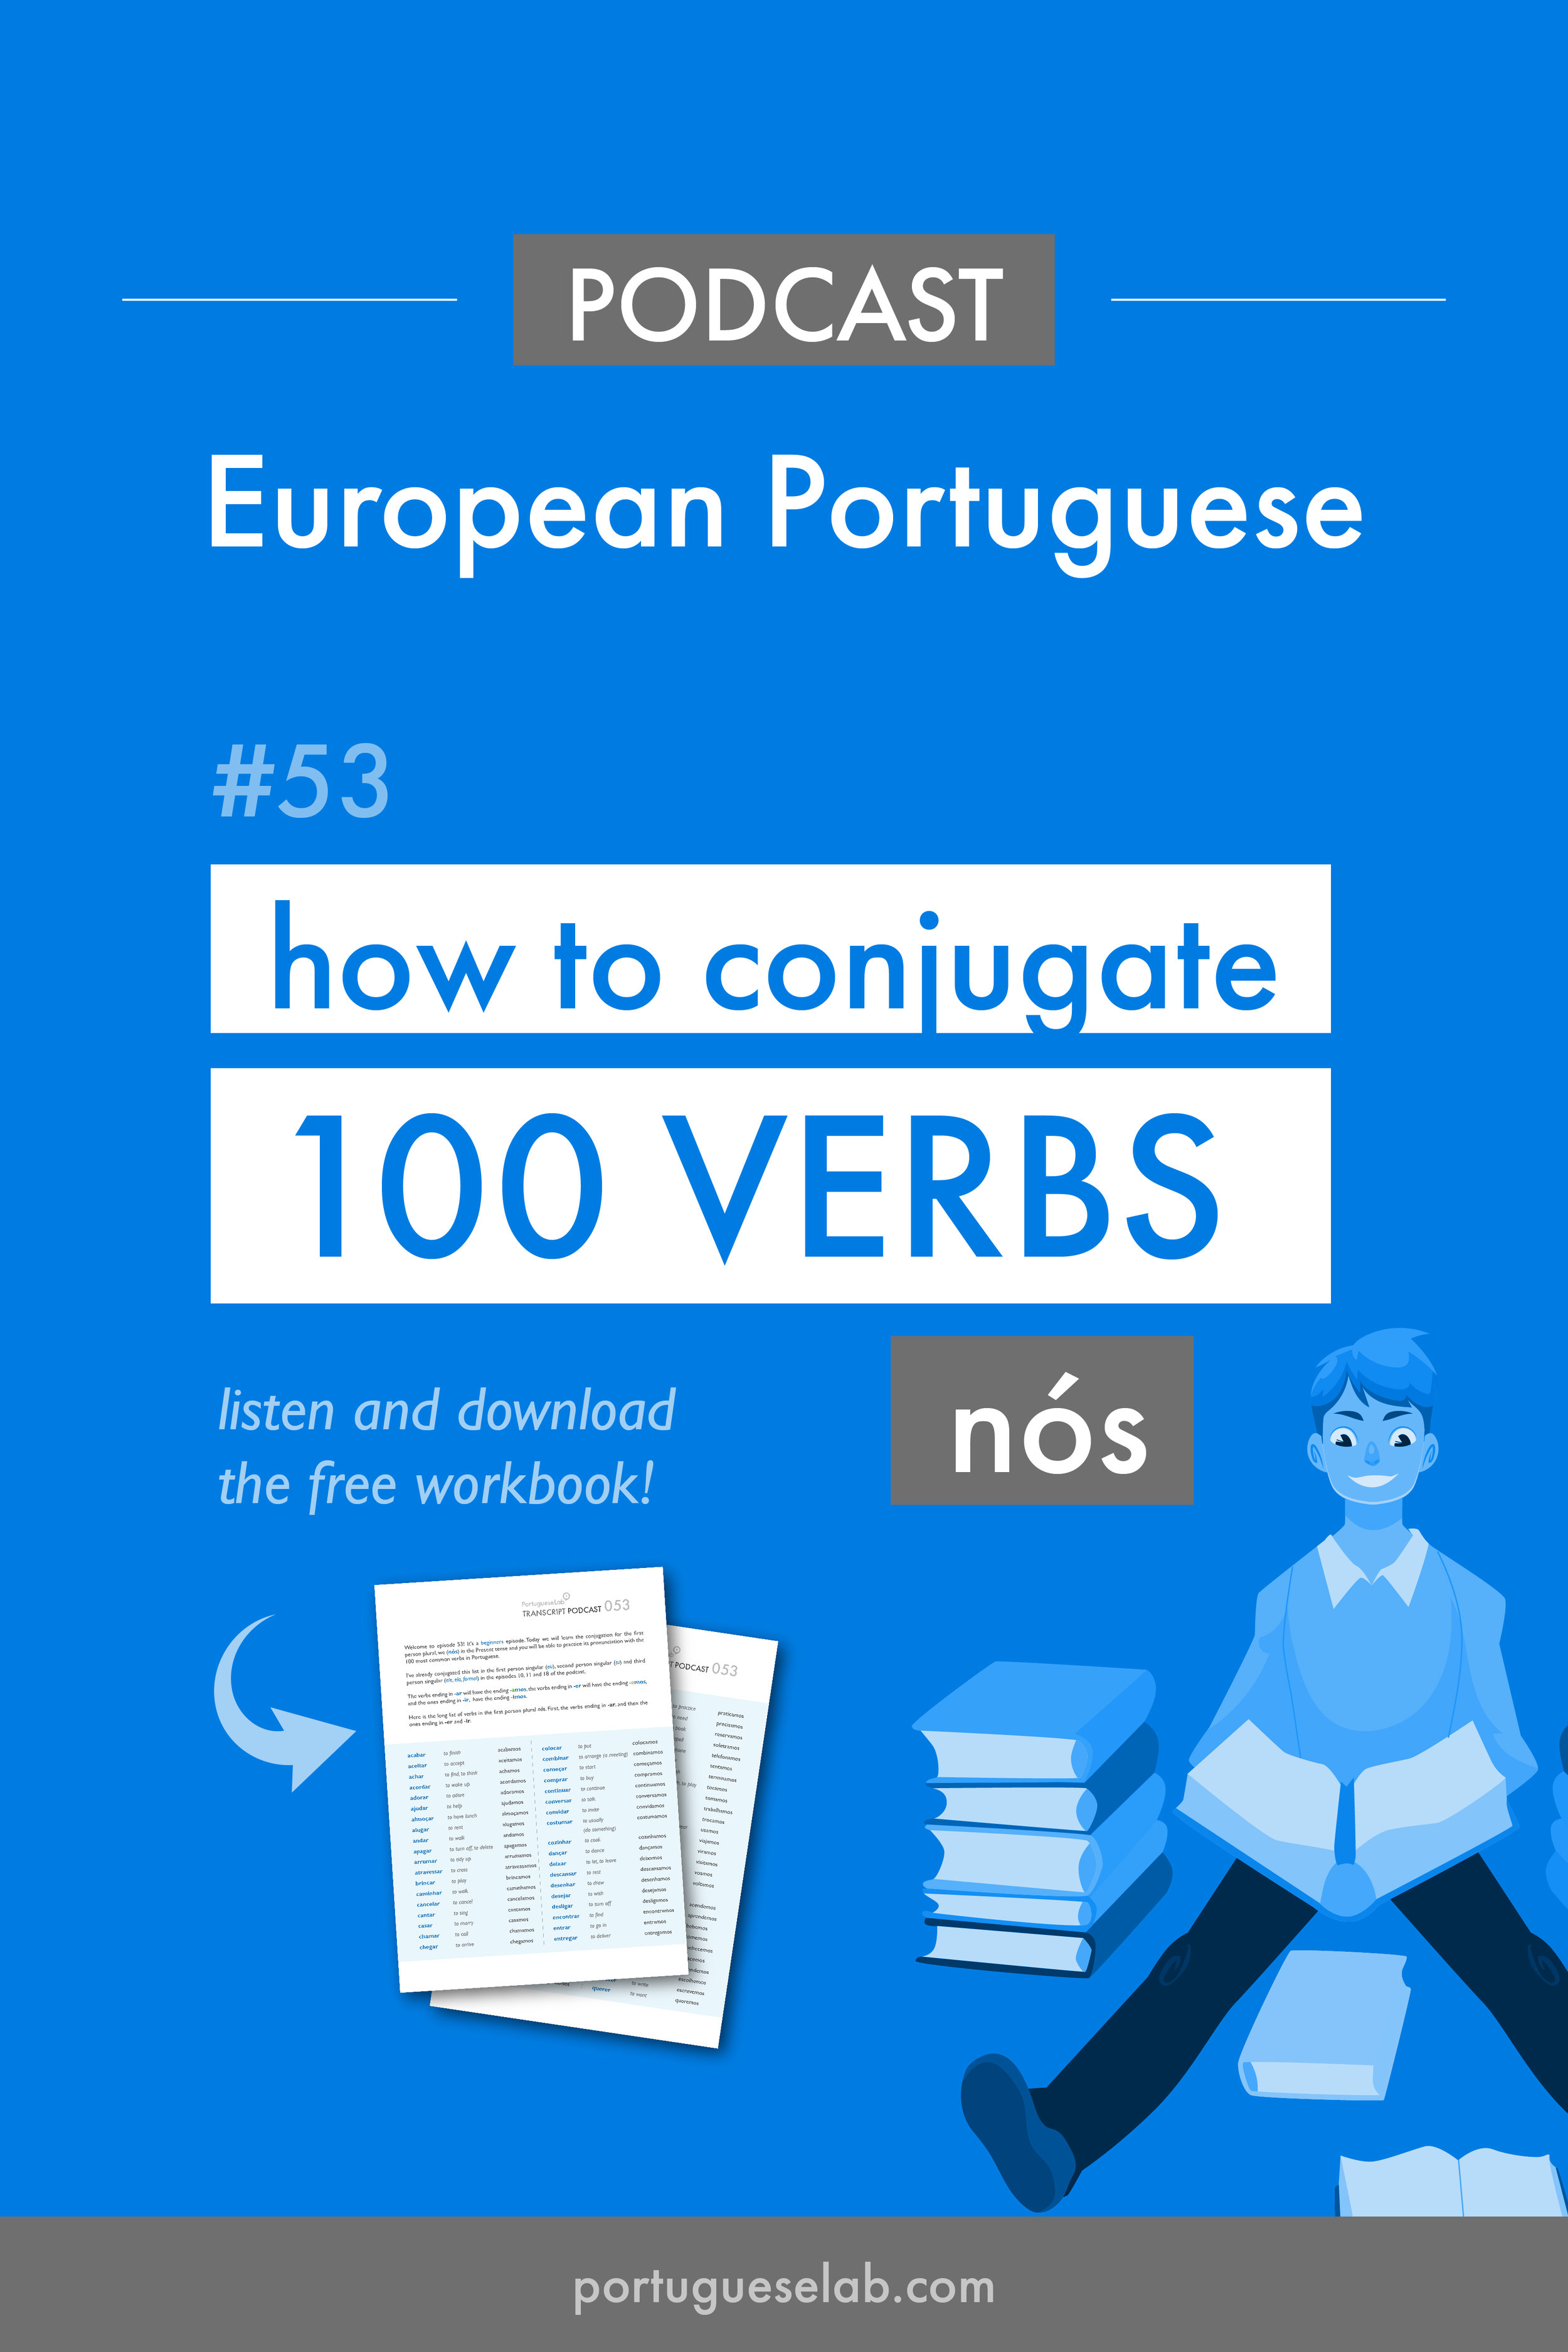 Portuguese Lab Podcast - European Portuguese - 53 - Conjugate 100 verbs - nos.jpg